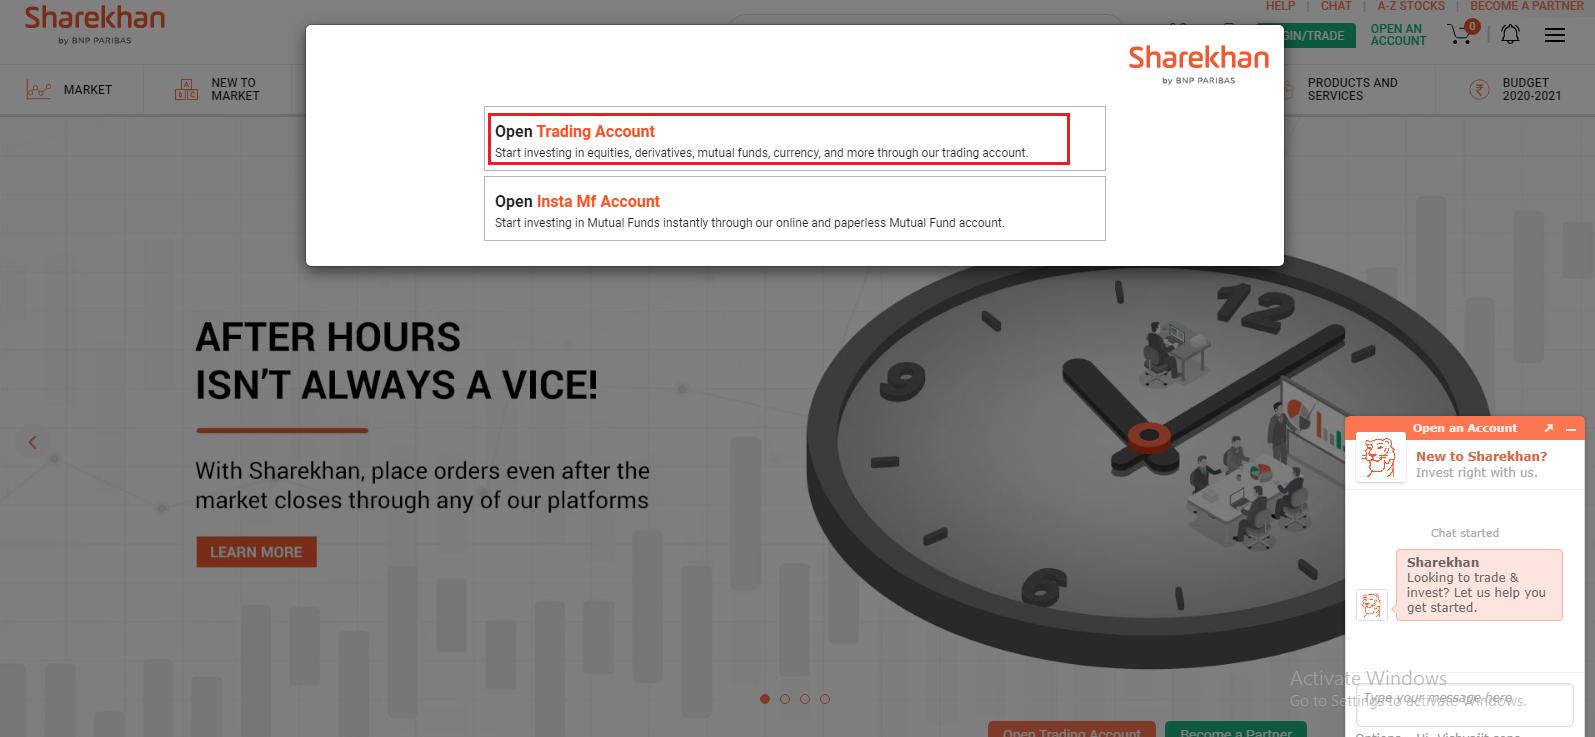 sharekhan open trading account